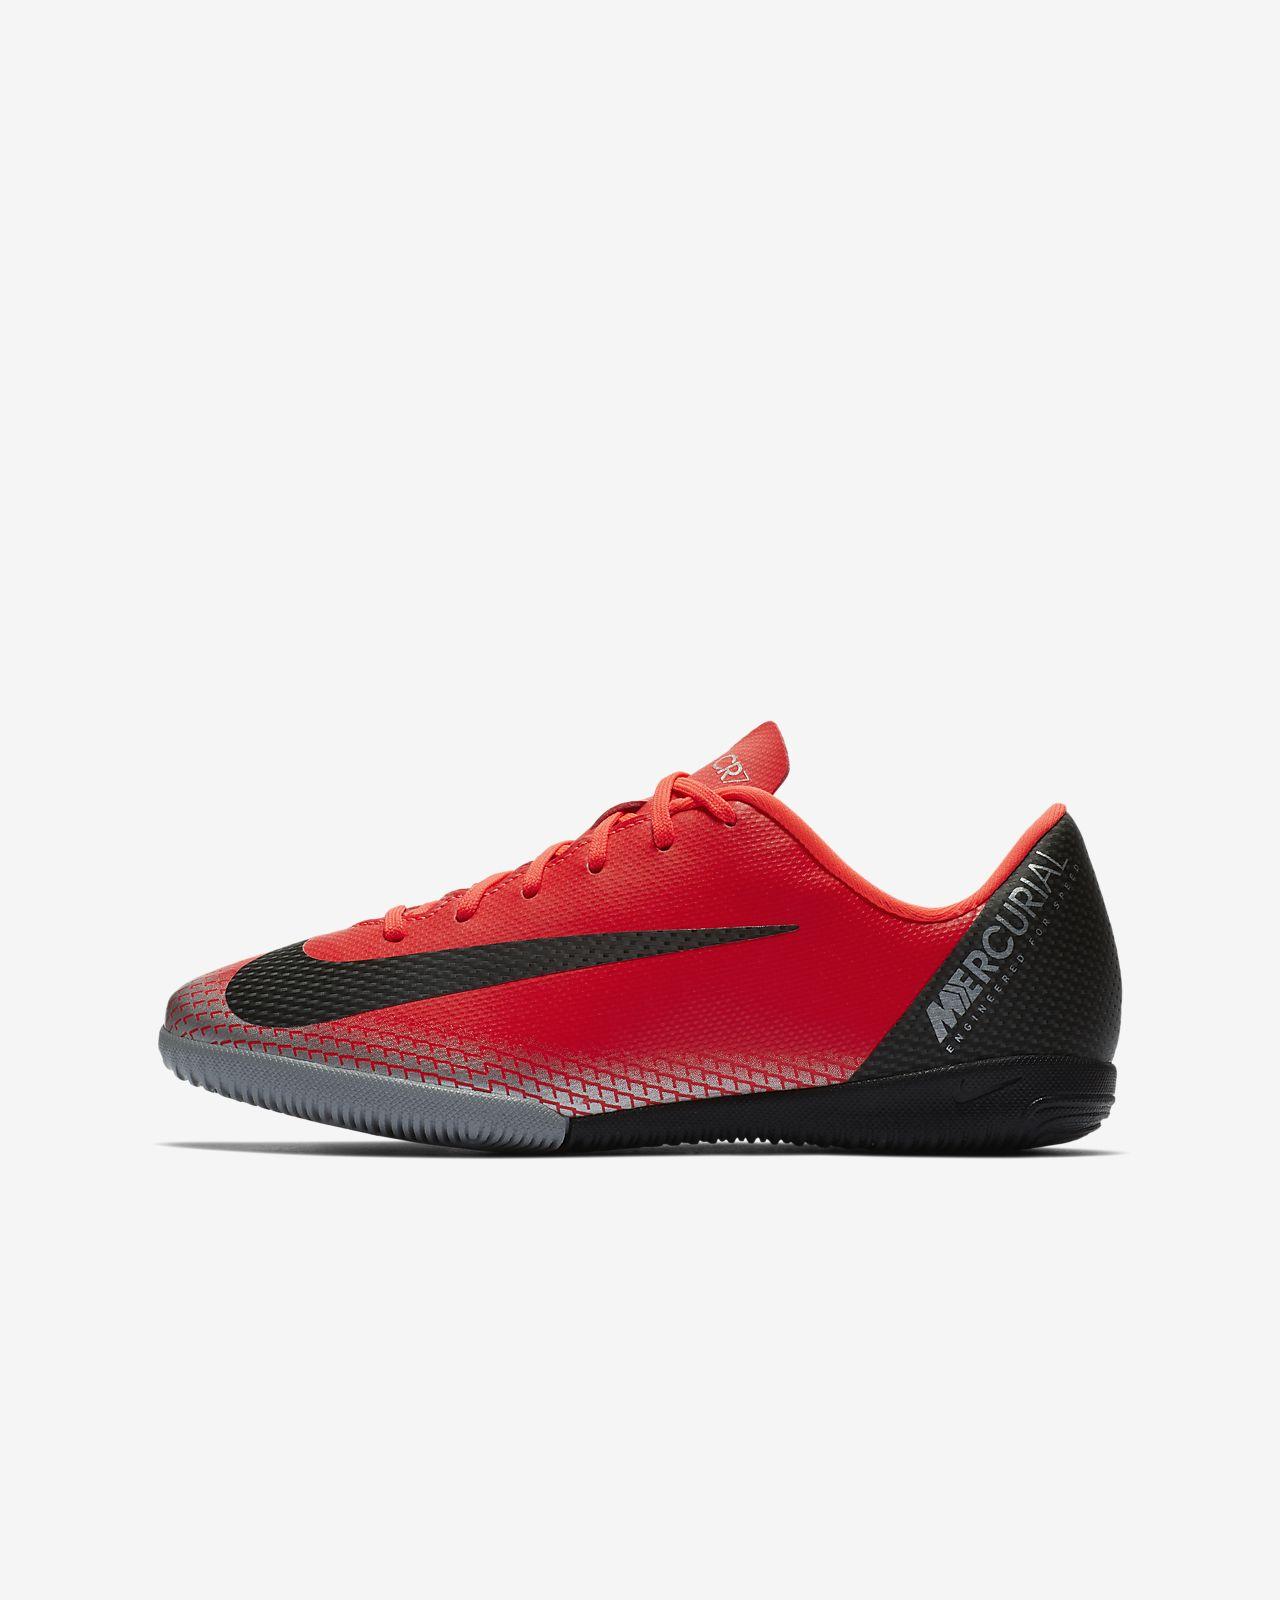 new arrival 52970 d4f9d ... Calzado de fútbol para cancha cubierta para niños talla grandepequeña  Nike Jr. MercurialX